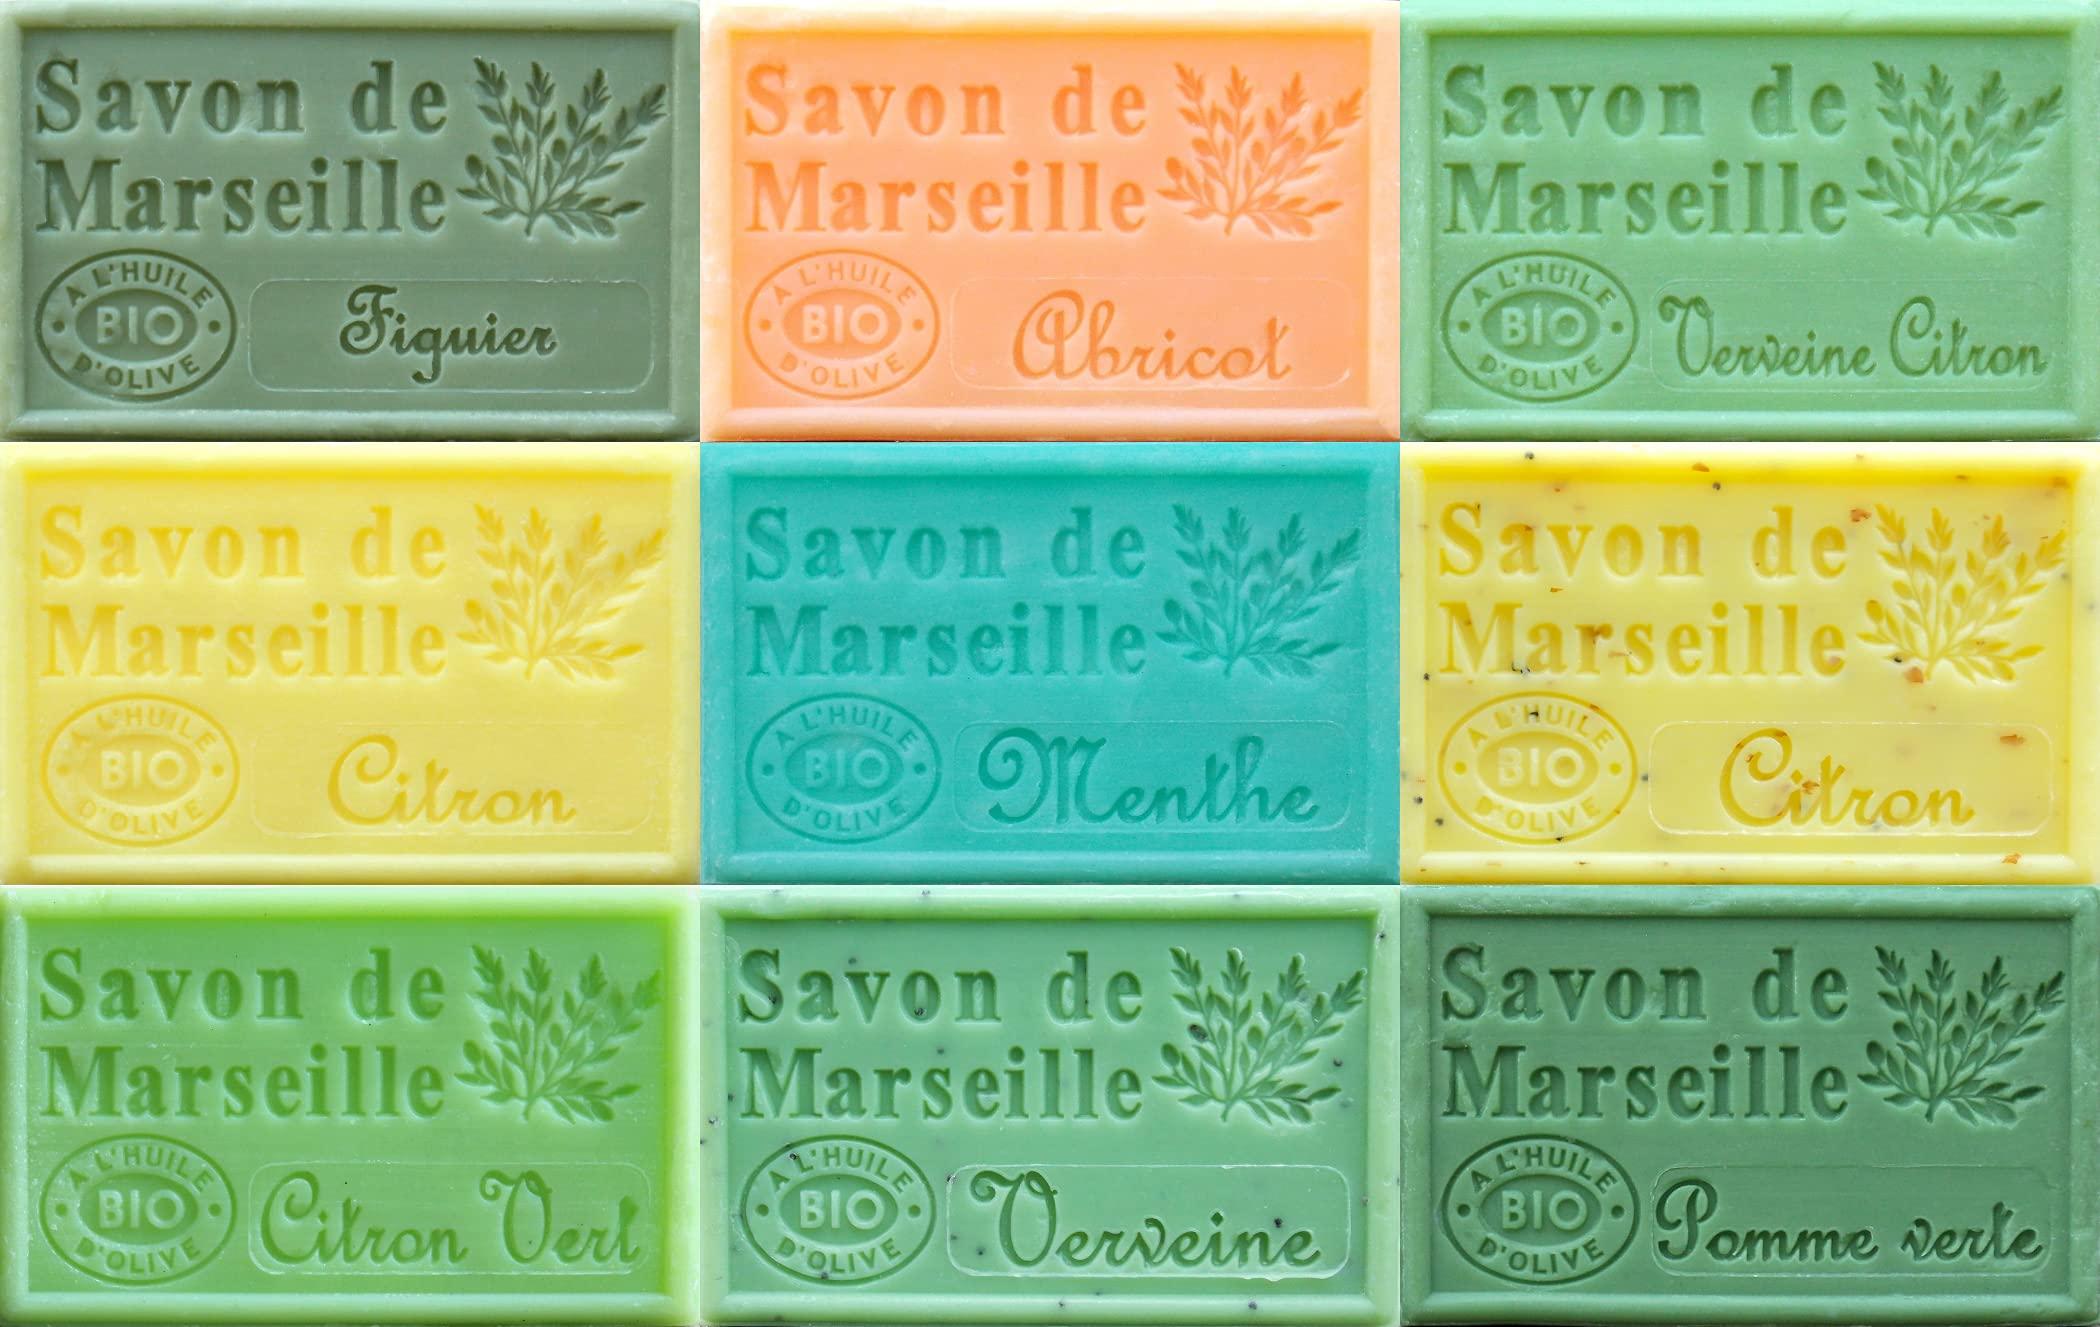 Savon de Marseille French Soaps, Boxed Set of 9 x 125g Soap Bars (Refreshing Fragrances), Vegetable Soap